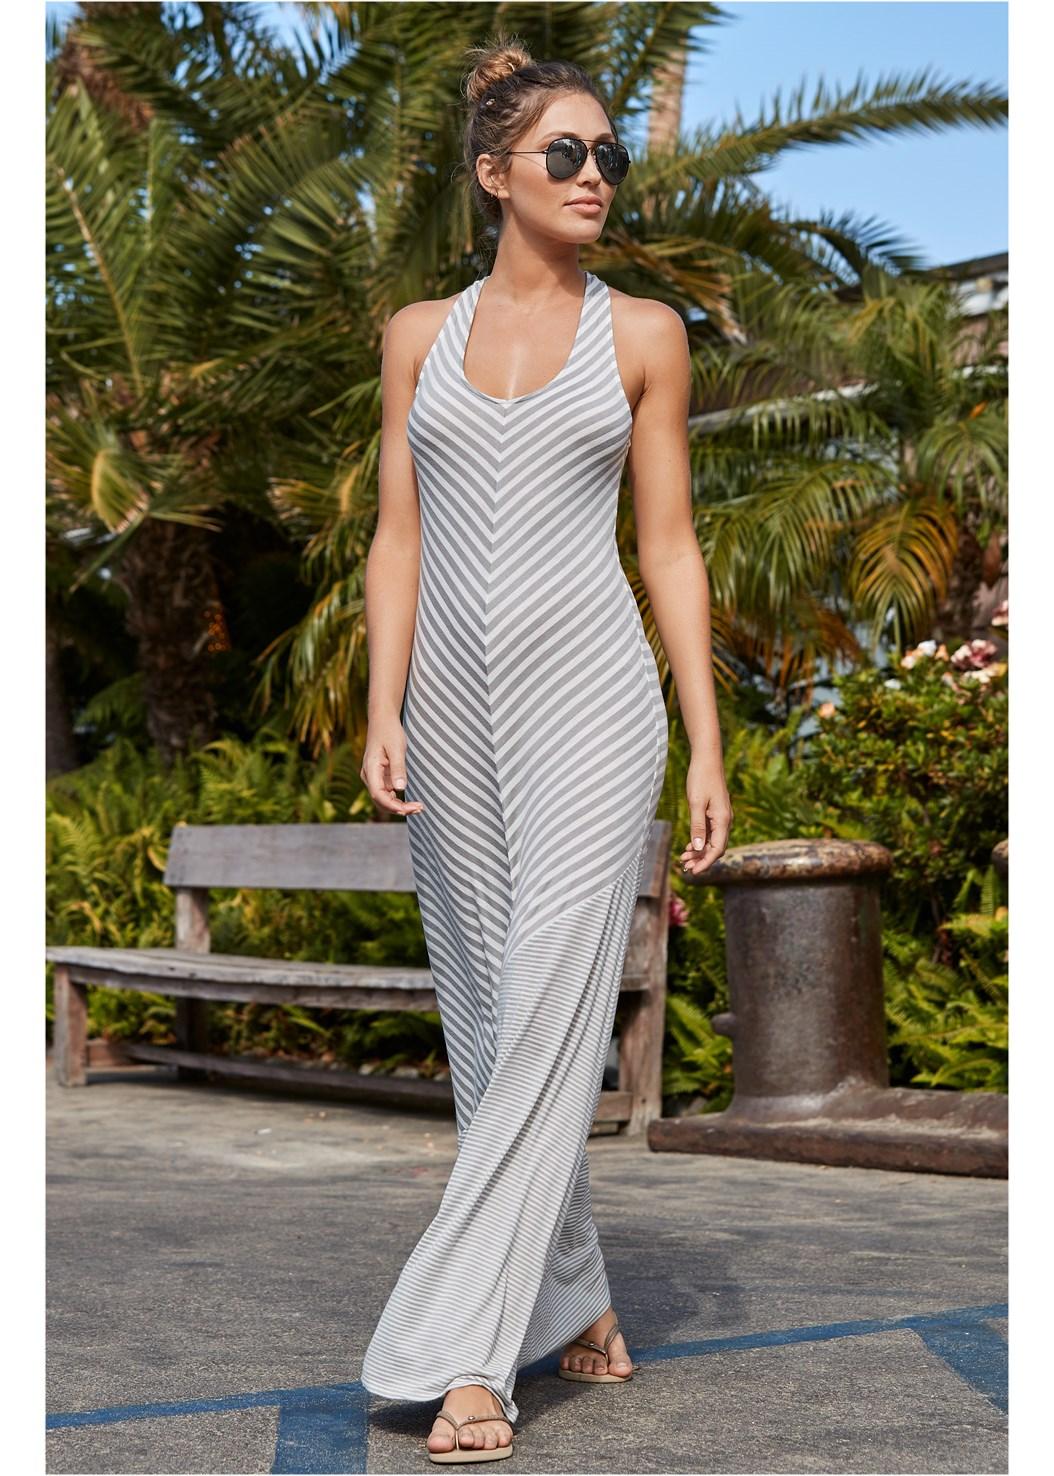 Striped Maxi Cover-Up,Crochet Trimmed Monokini